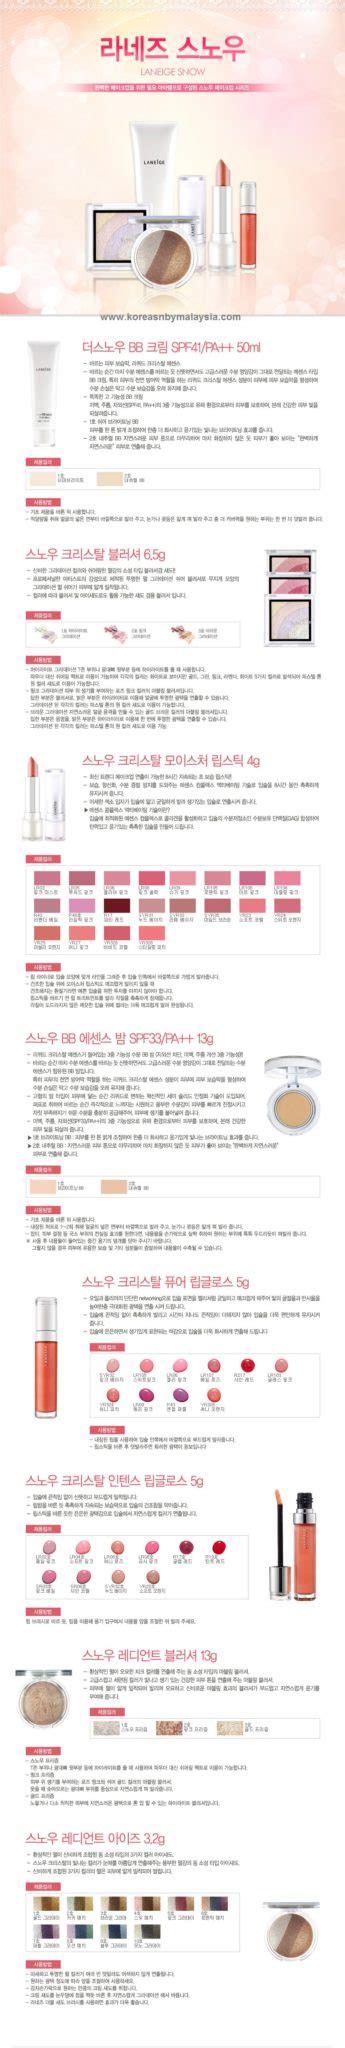 Laneige Snow Bb Spf30 Pa 50 Ml laneige snow bb korean cosmetic brand malaysia